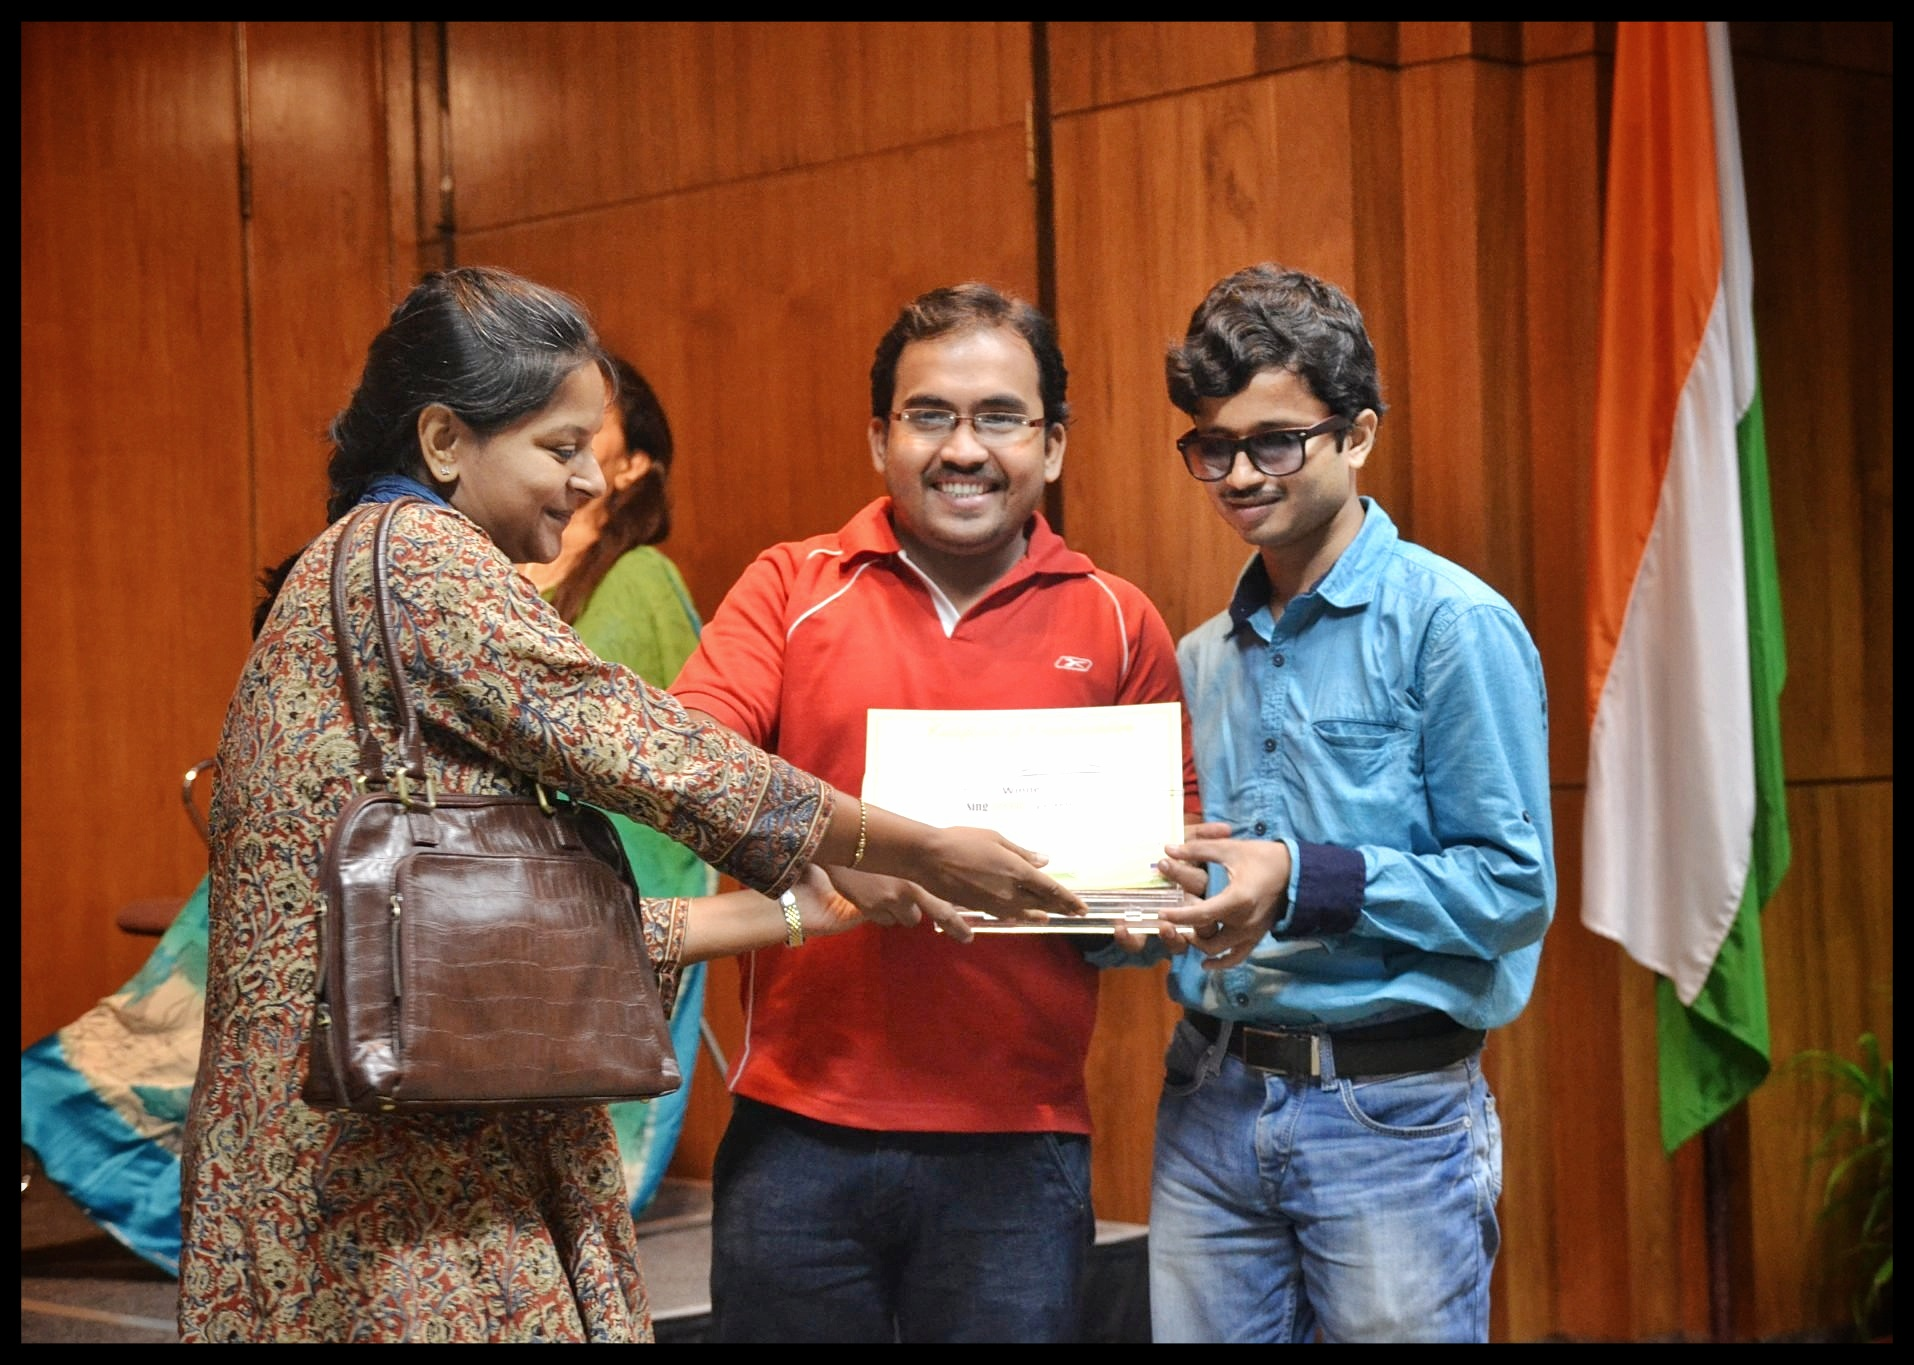 Pradip is taking the Sing Green Award with Pinaki